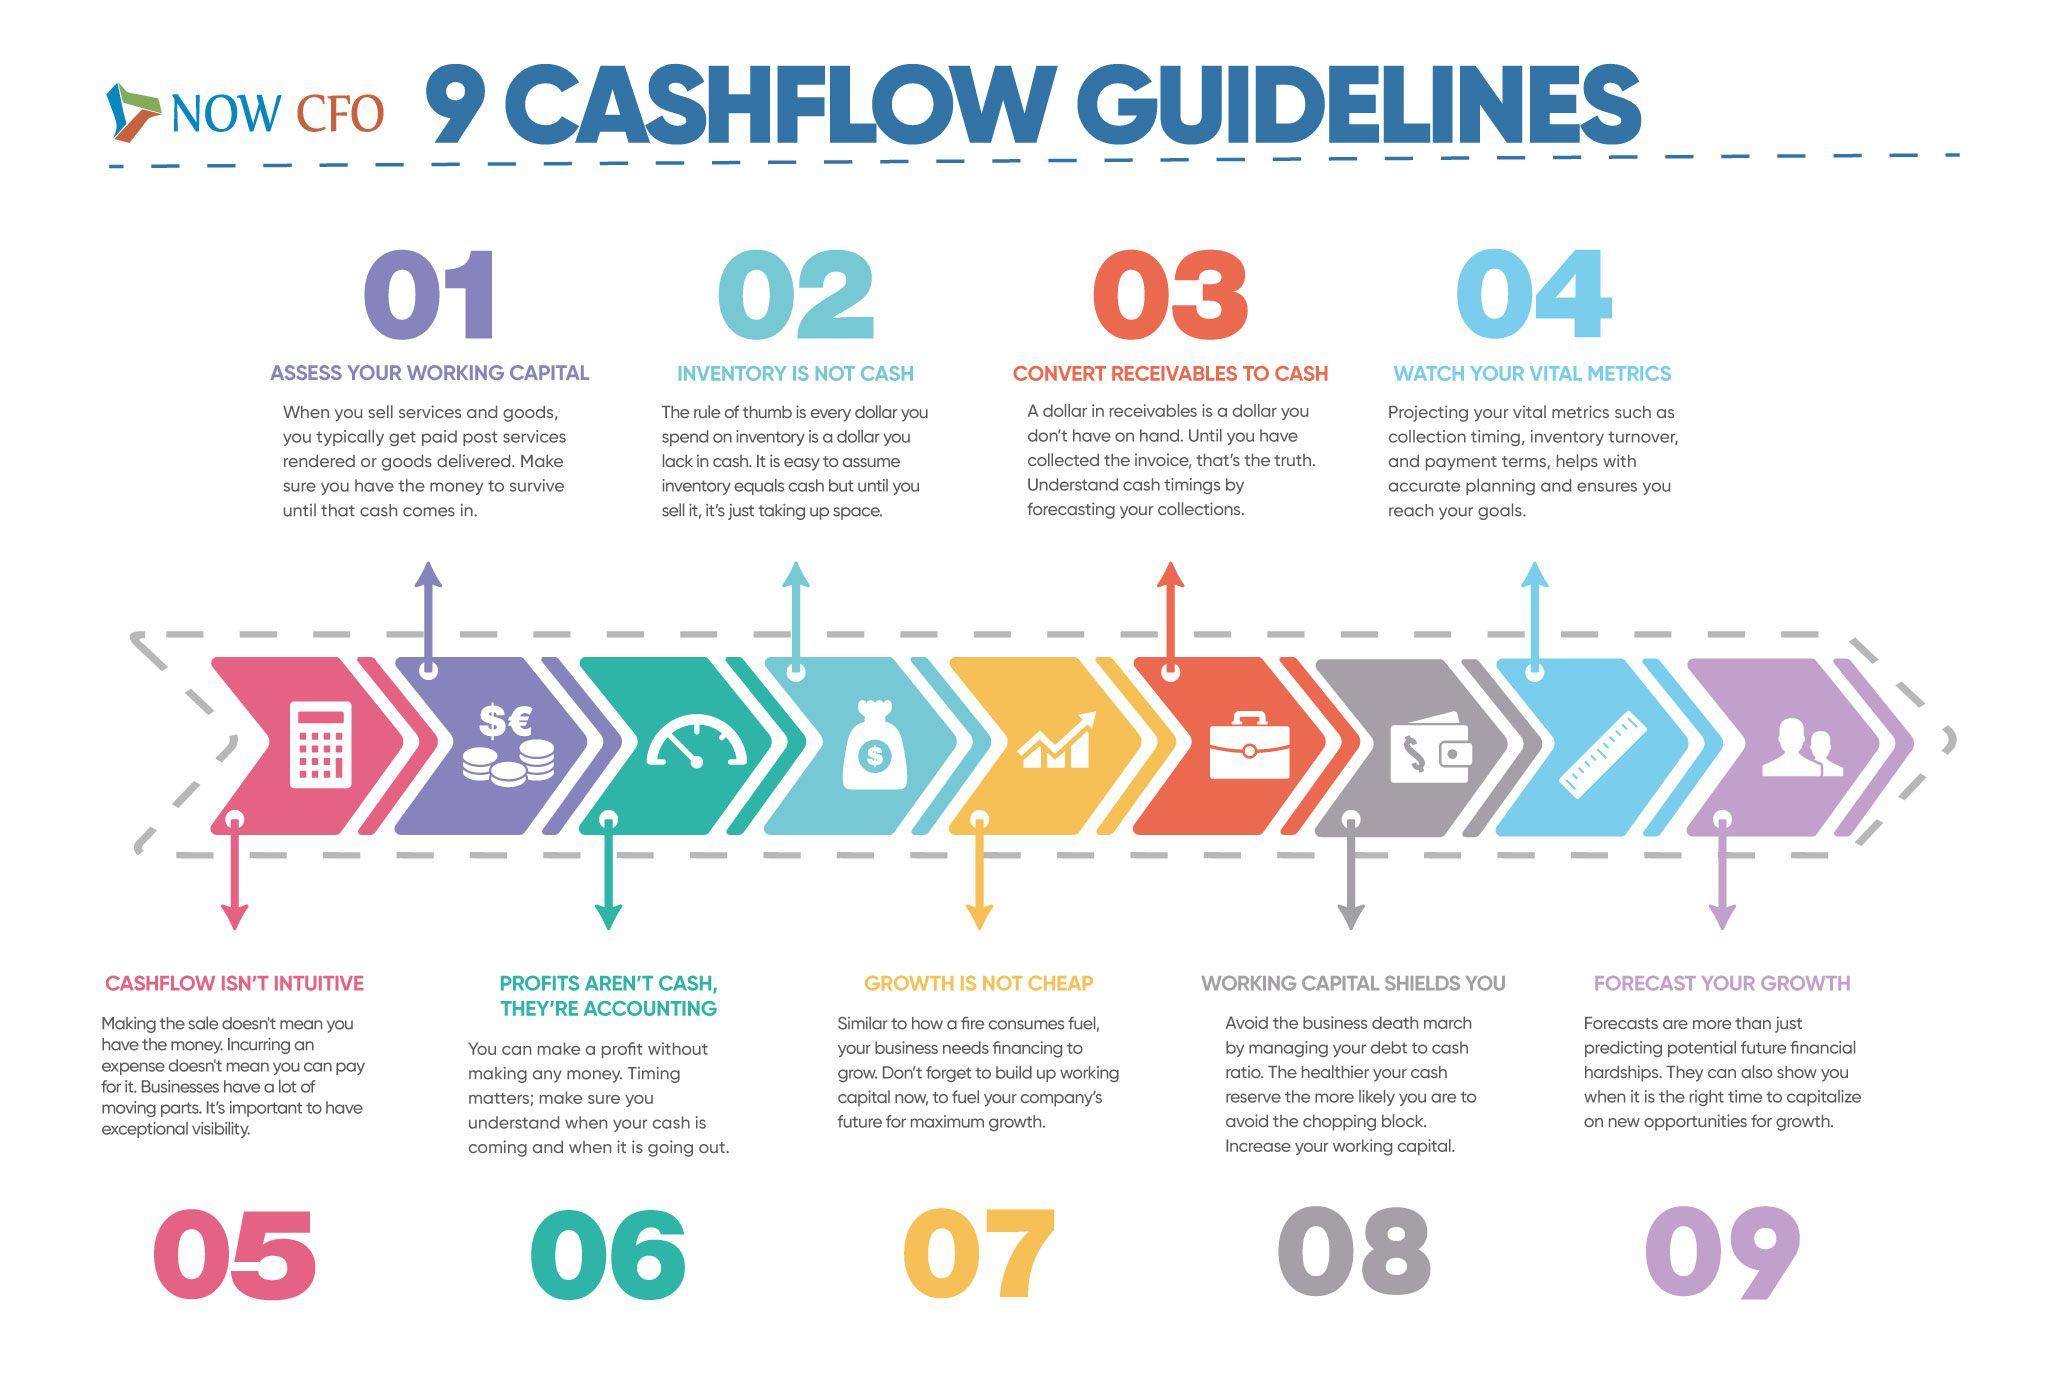 cashflow guidelines